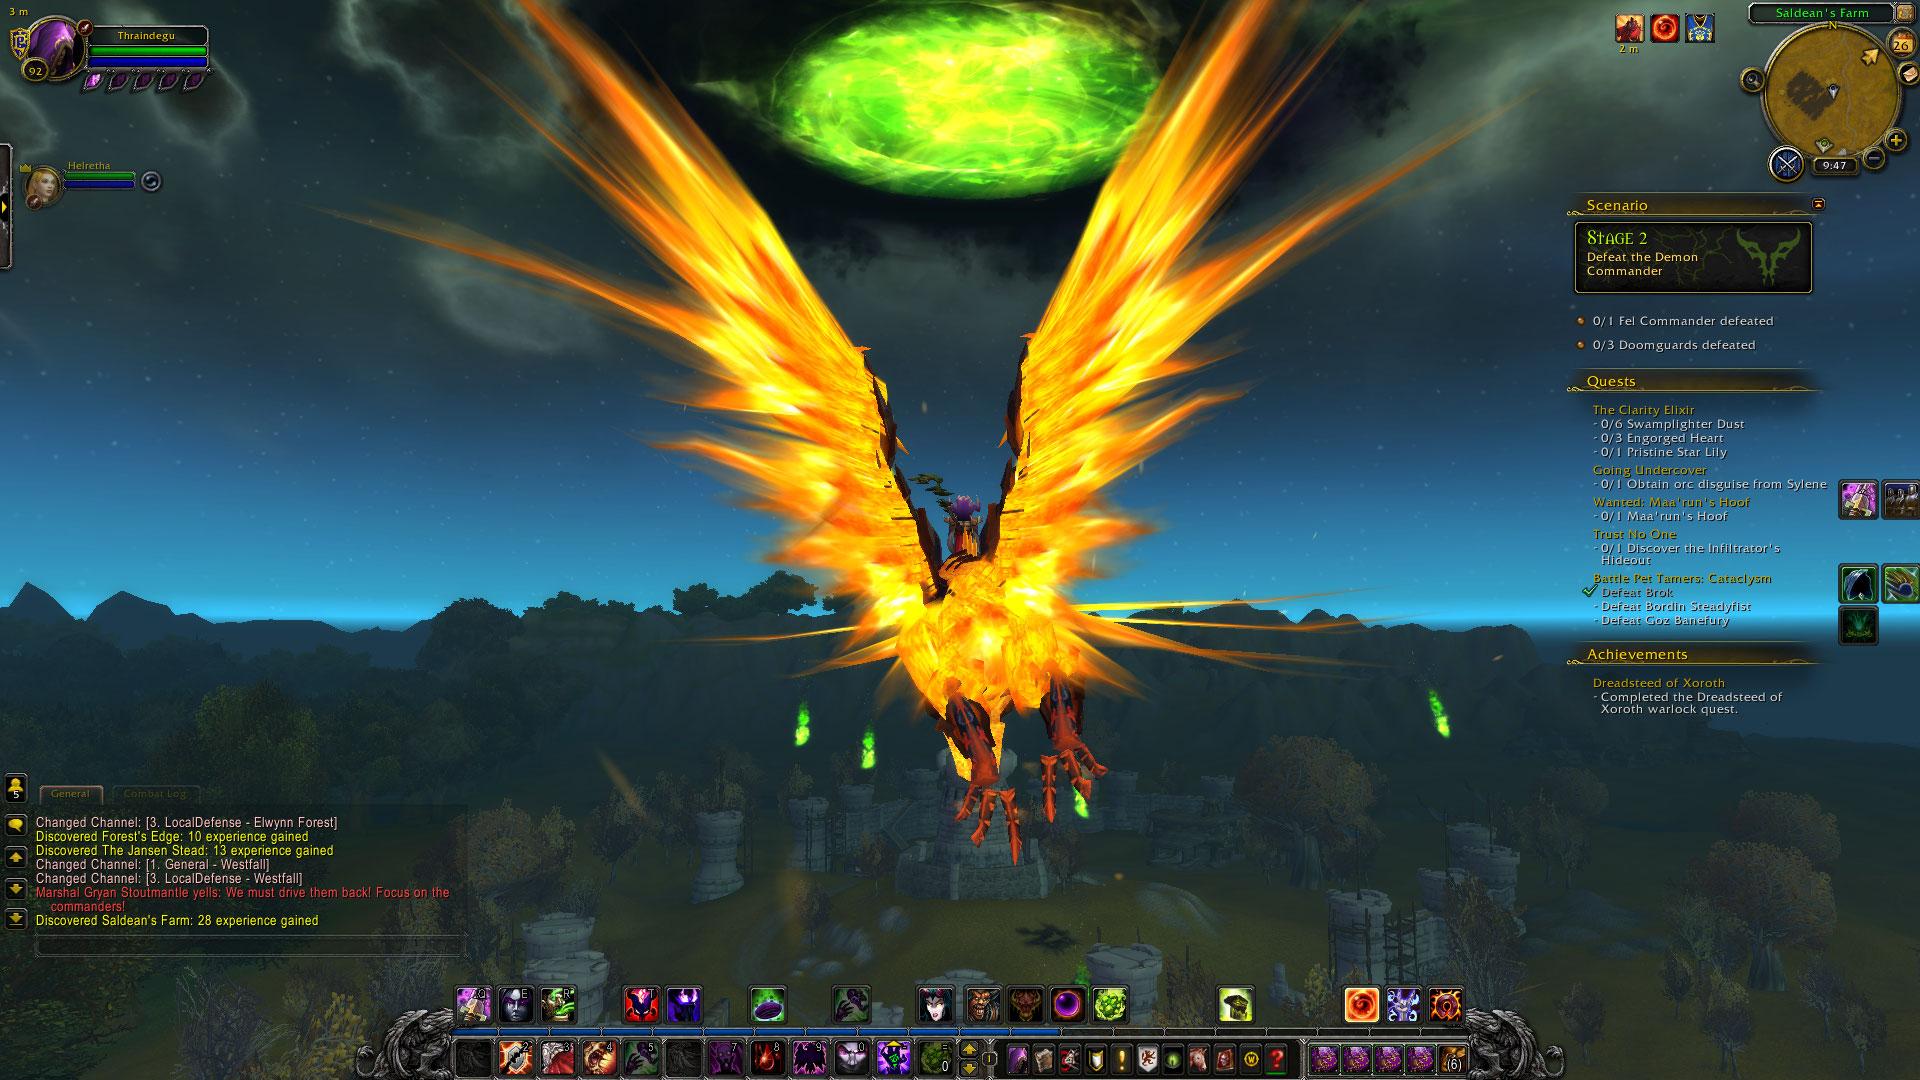 World of Warcraft: Legion fotoseriál - Plamenná legie přichází 129821